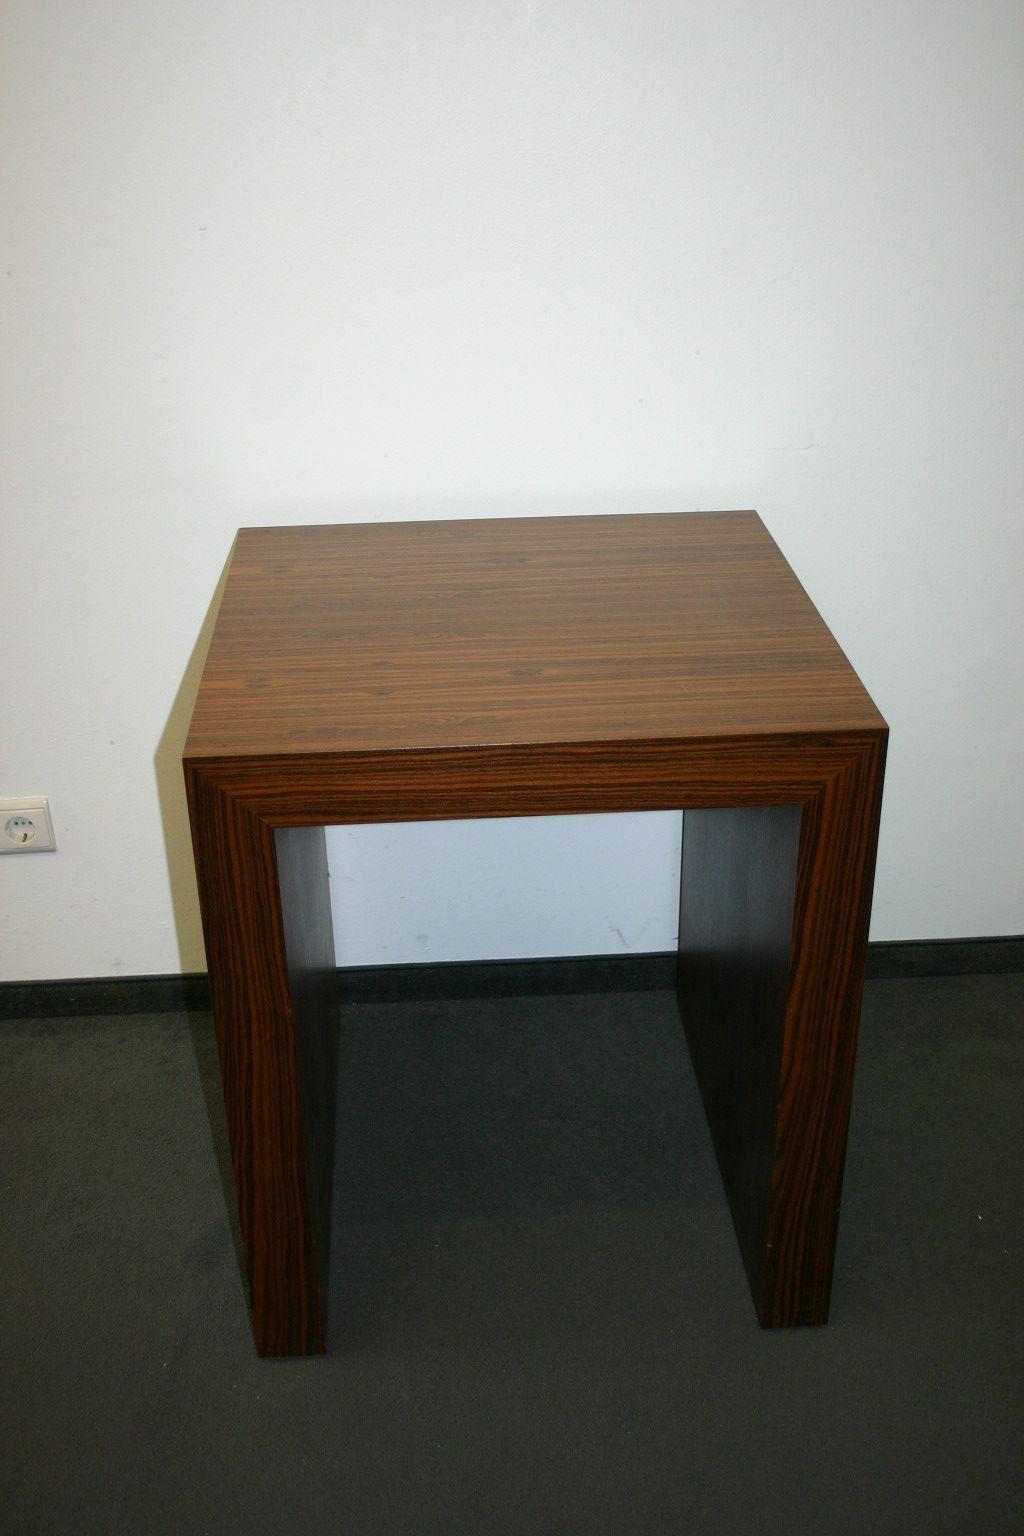 beistelltisch in holz. Black Bedroom Furniture Sets. Home Design Ideas